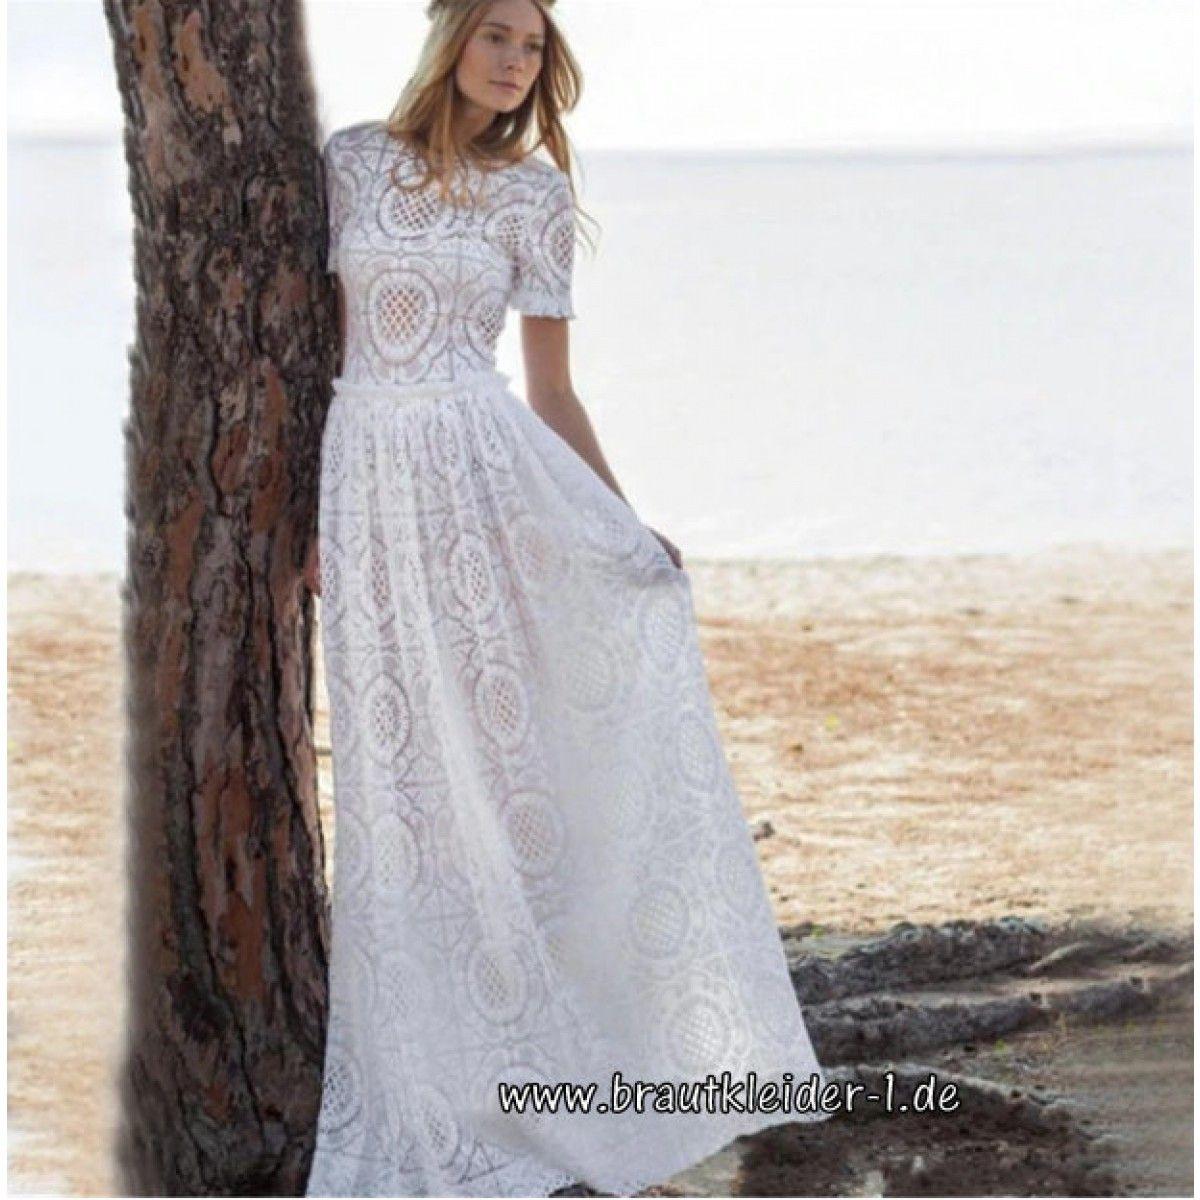 Großartig Boho Abendkleid Vertrieb10 Wunderbar Boho Abendkleid für 2019